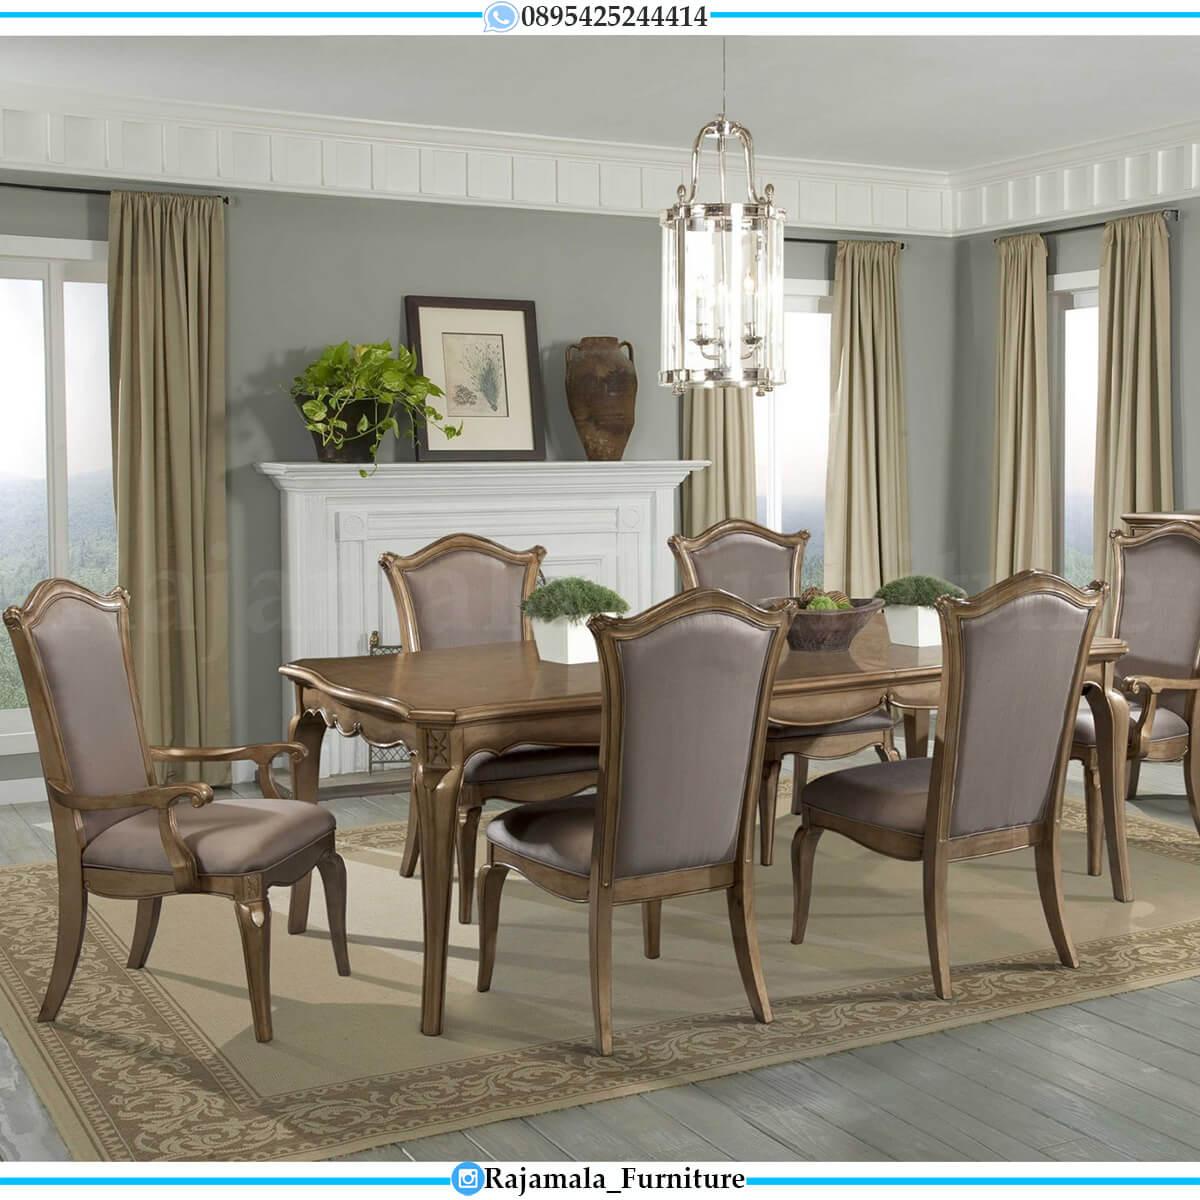 Desain Meja Makan Minimalis Jati Classic Natural Luxury Palace RM-0592